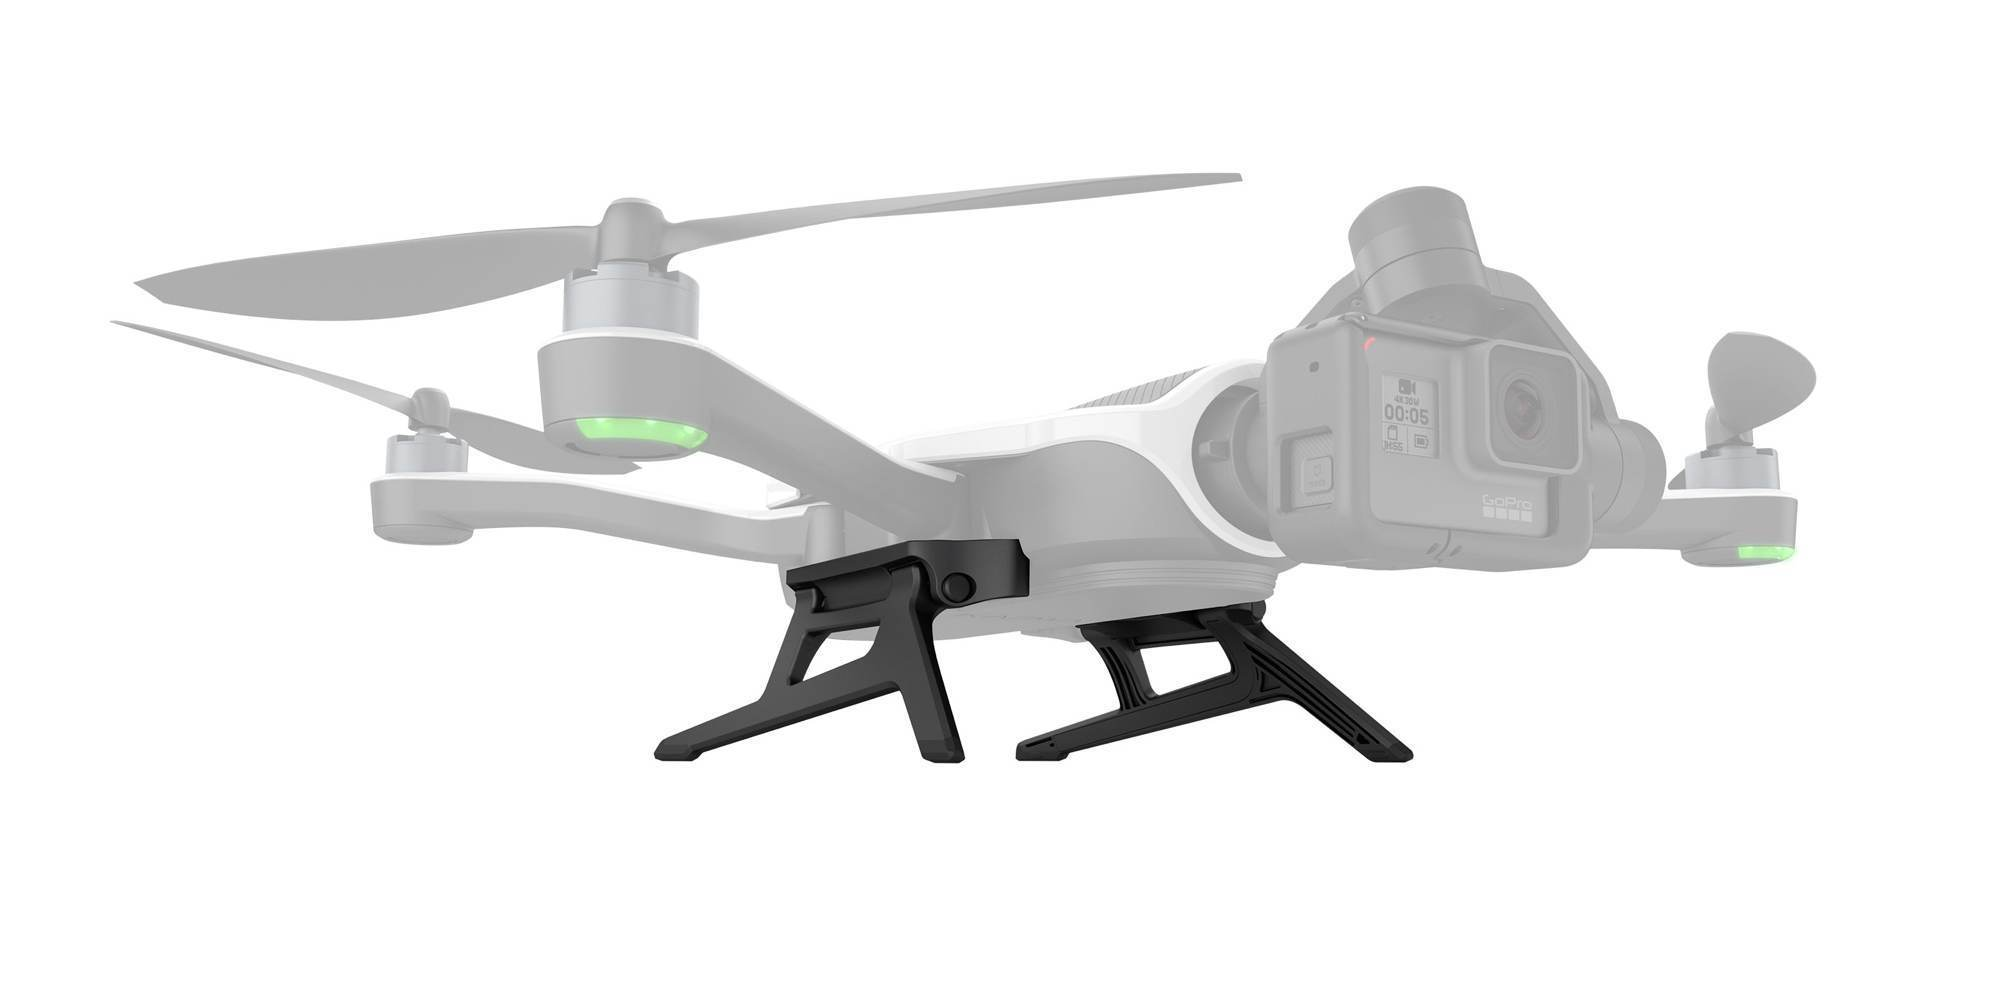 Шасси для квадрокоптера GoPro Karma Replacement Landing Gear (RQSGR-001)